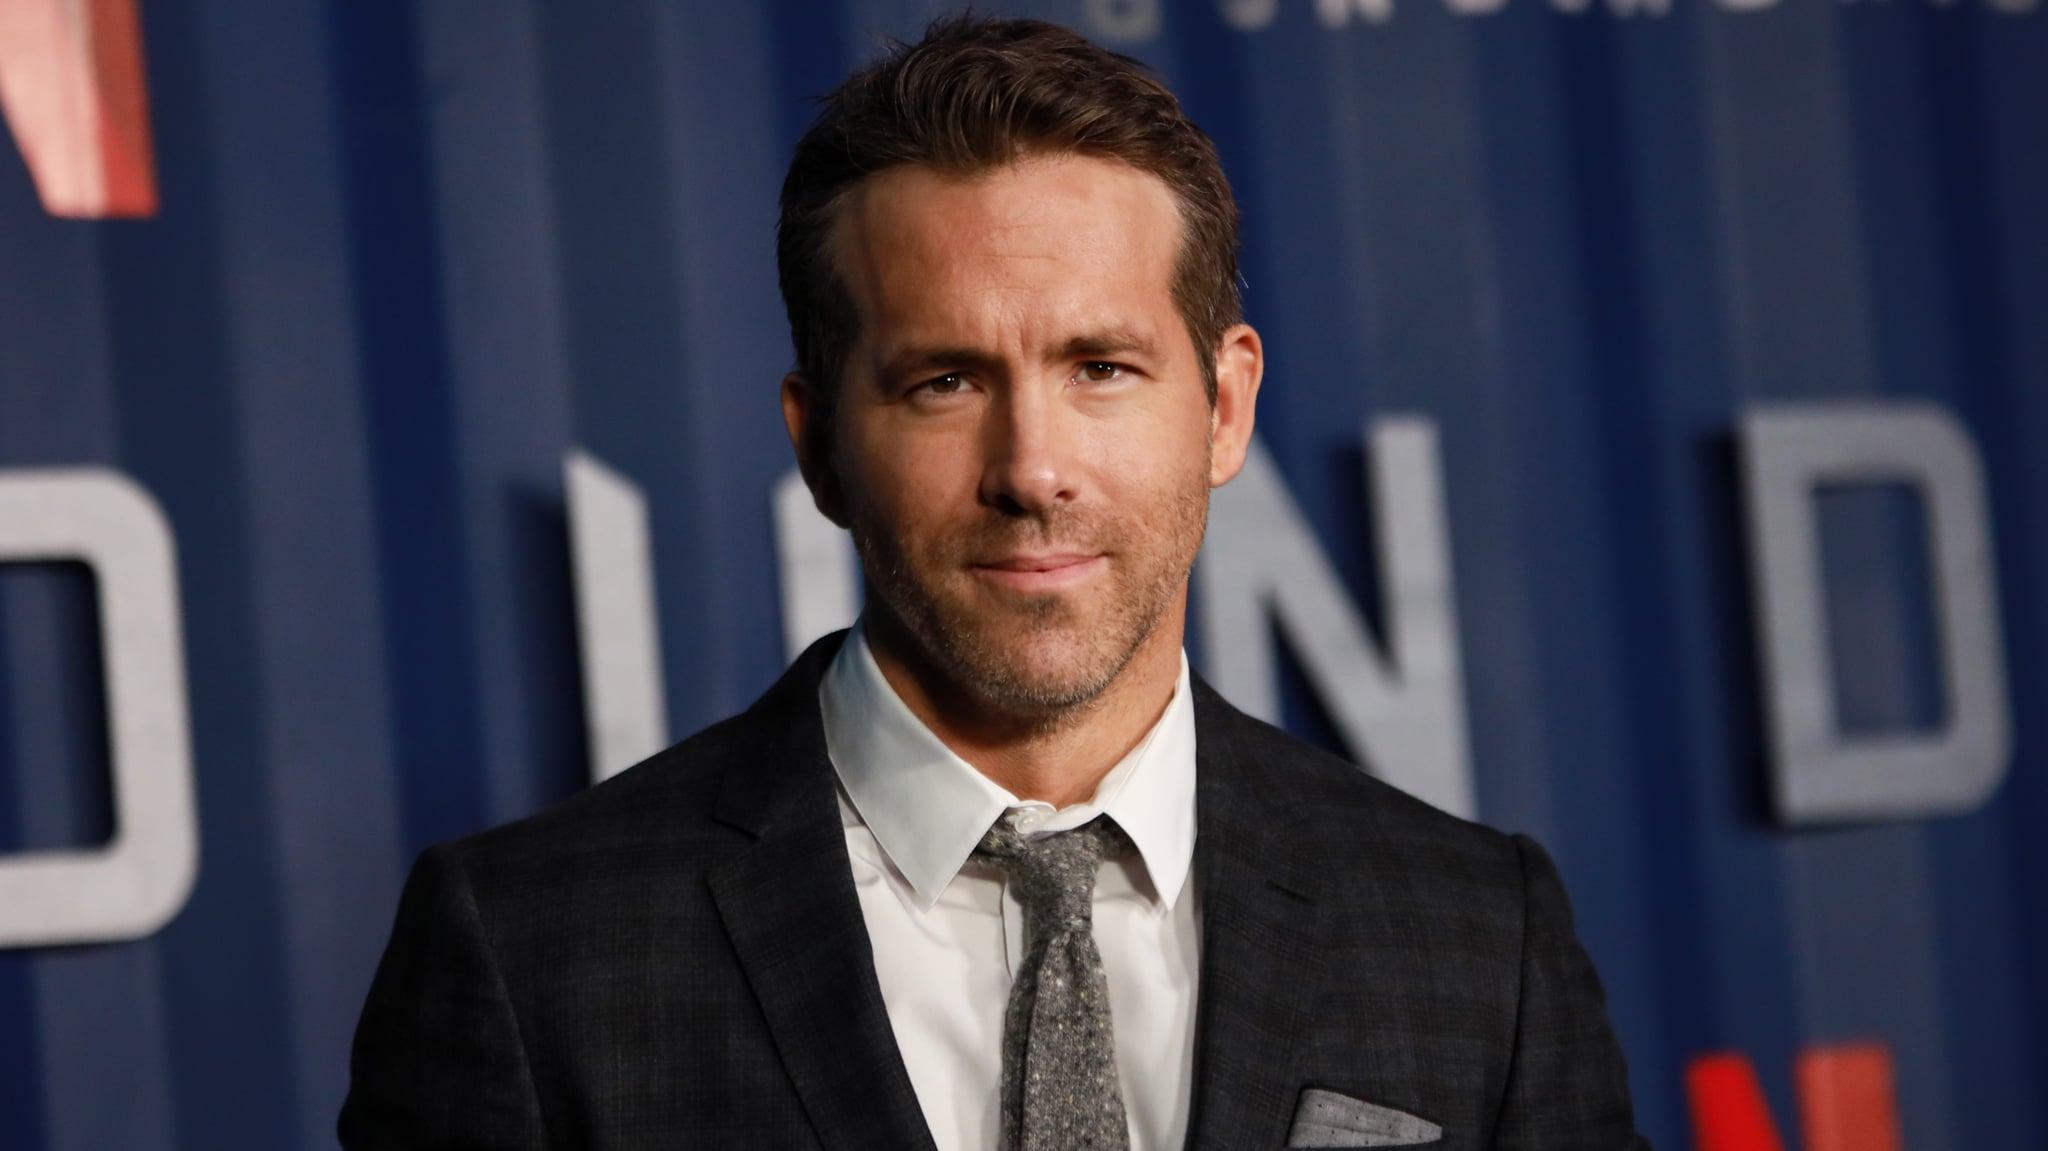 NEW YORK, NY - DECEMBER 10: Ryan Reynolds attends Netflix's